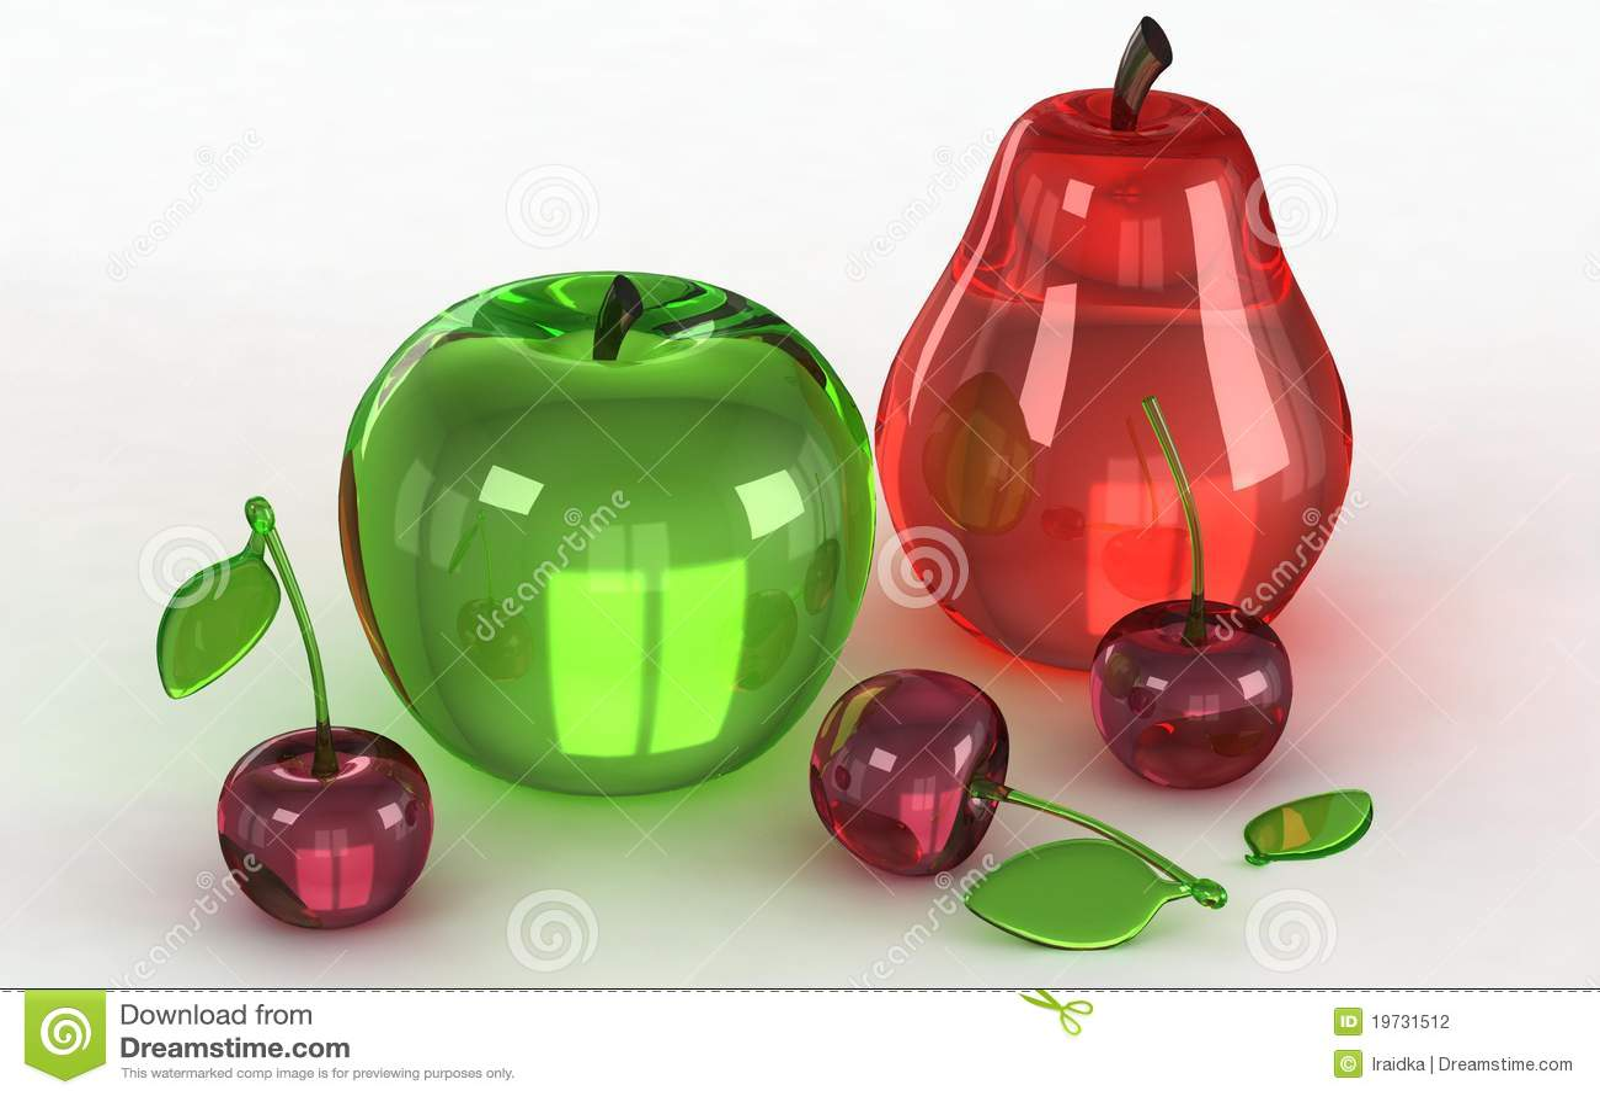 Modelos de cristal de frutas fotograf a de archivo for Frutas de cristal